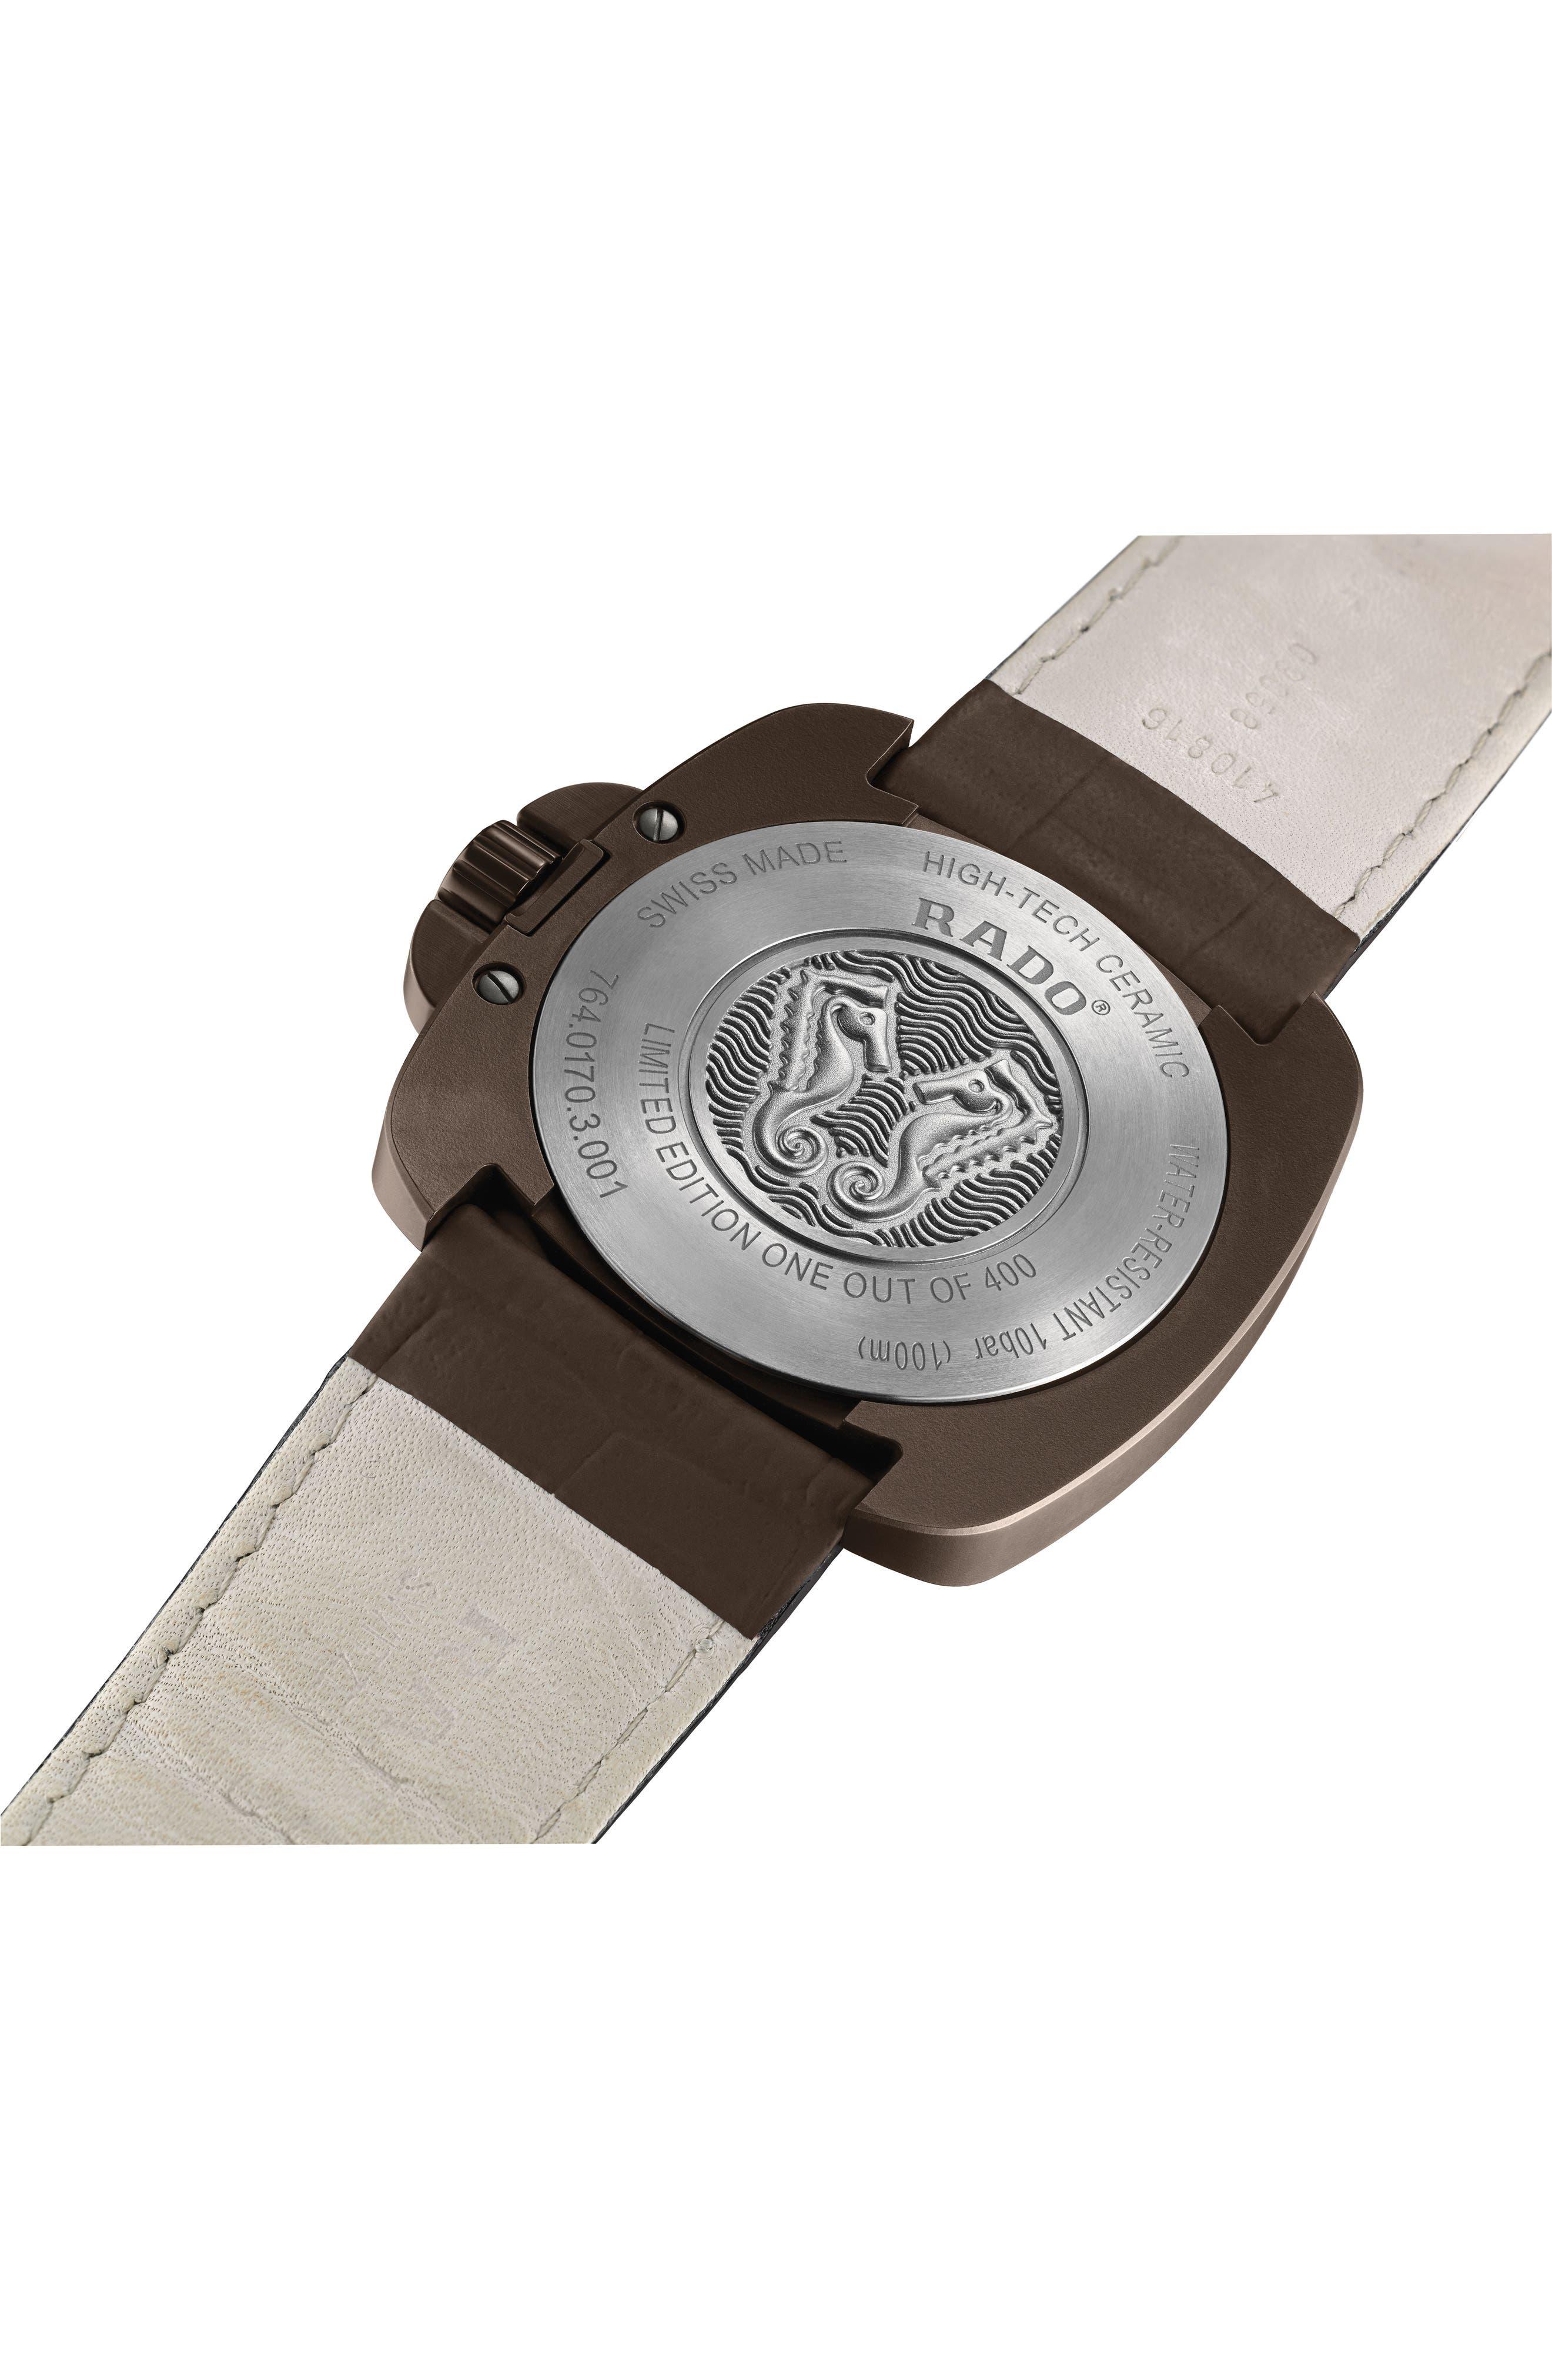 Alternate Image 2  - RADO HyperChrome 1616 Automatic Leather Strap Watch, 46mm